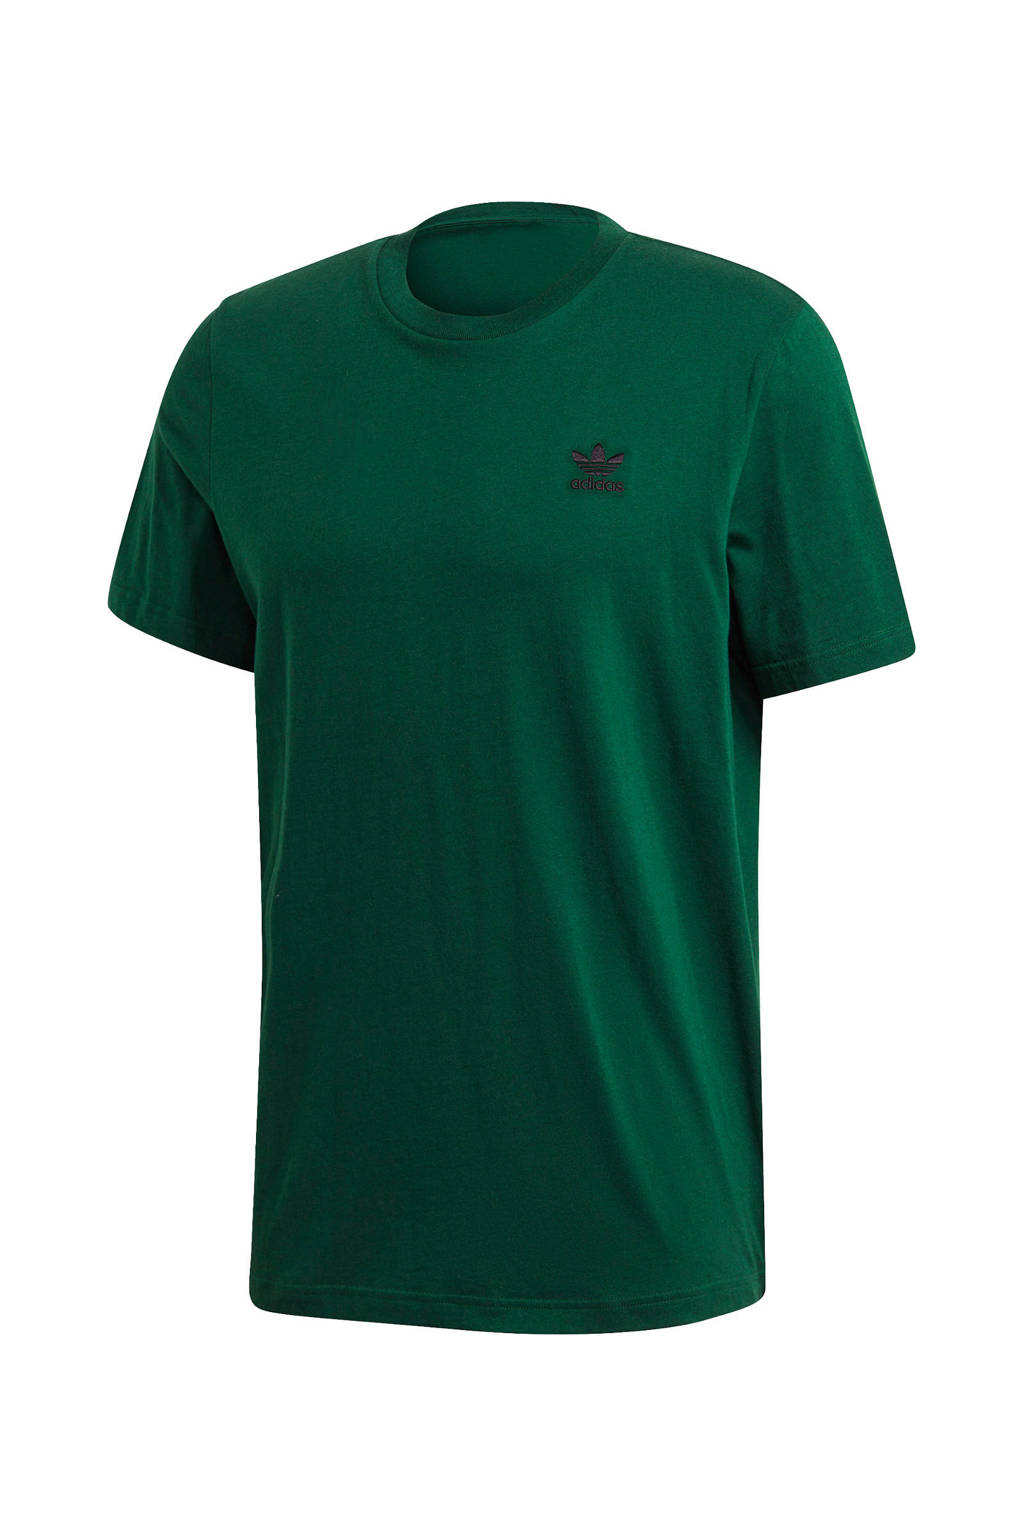 adidas Originals T-shirt donkergroen, Donkergroen